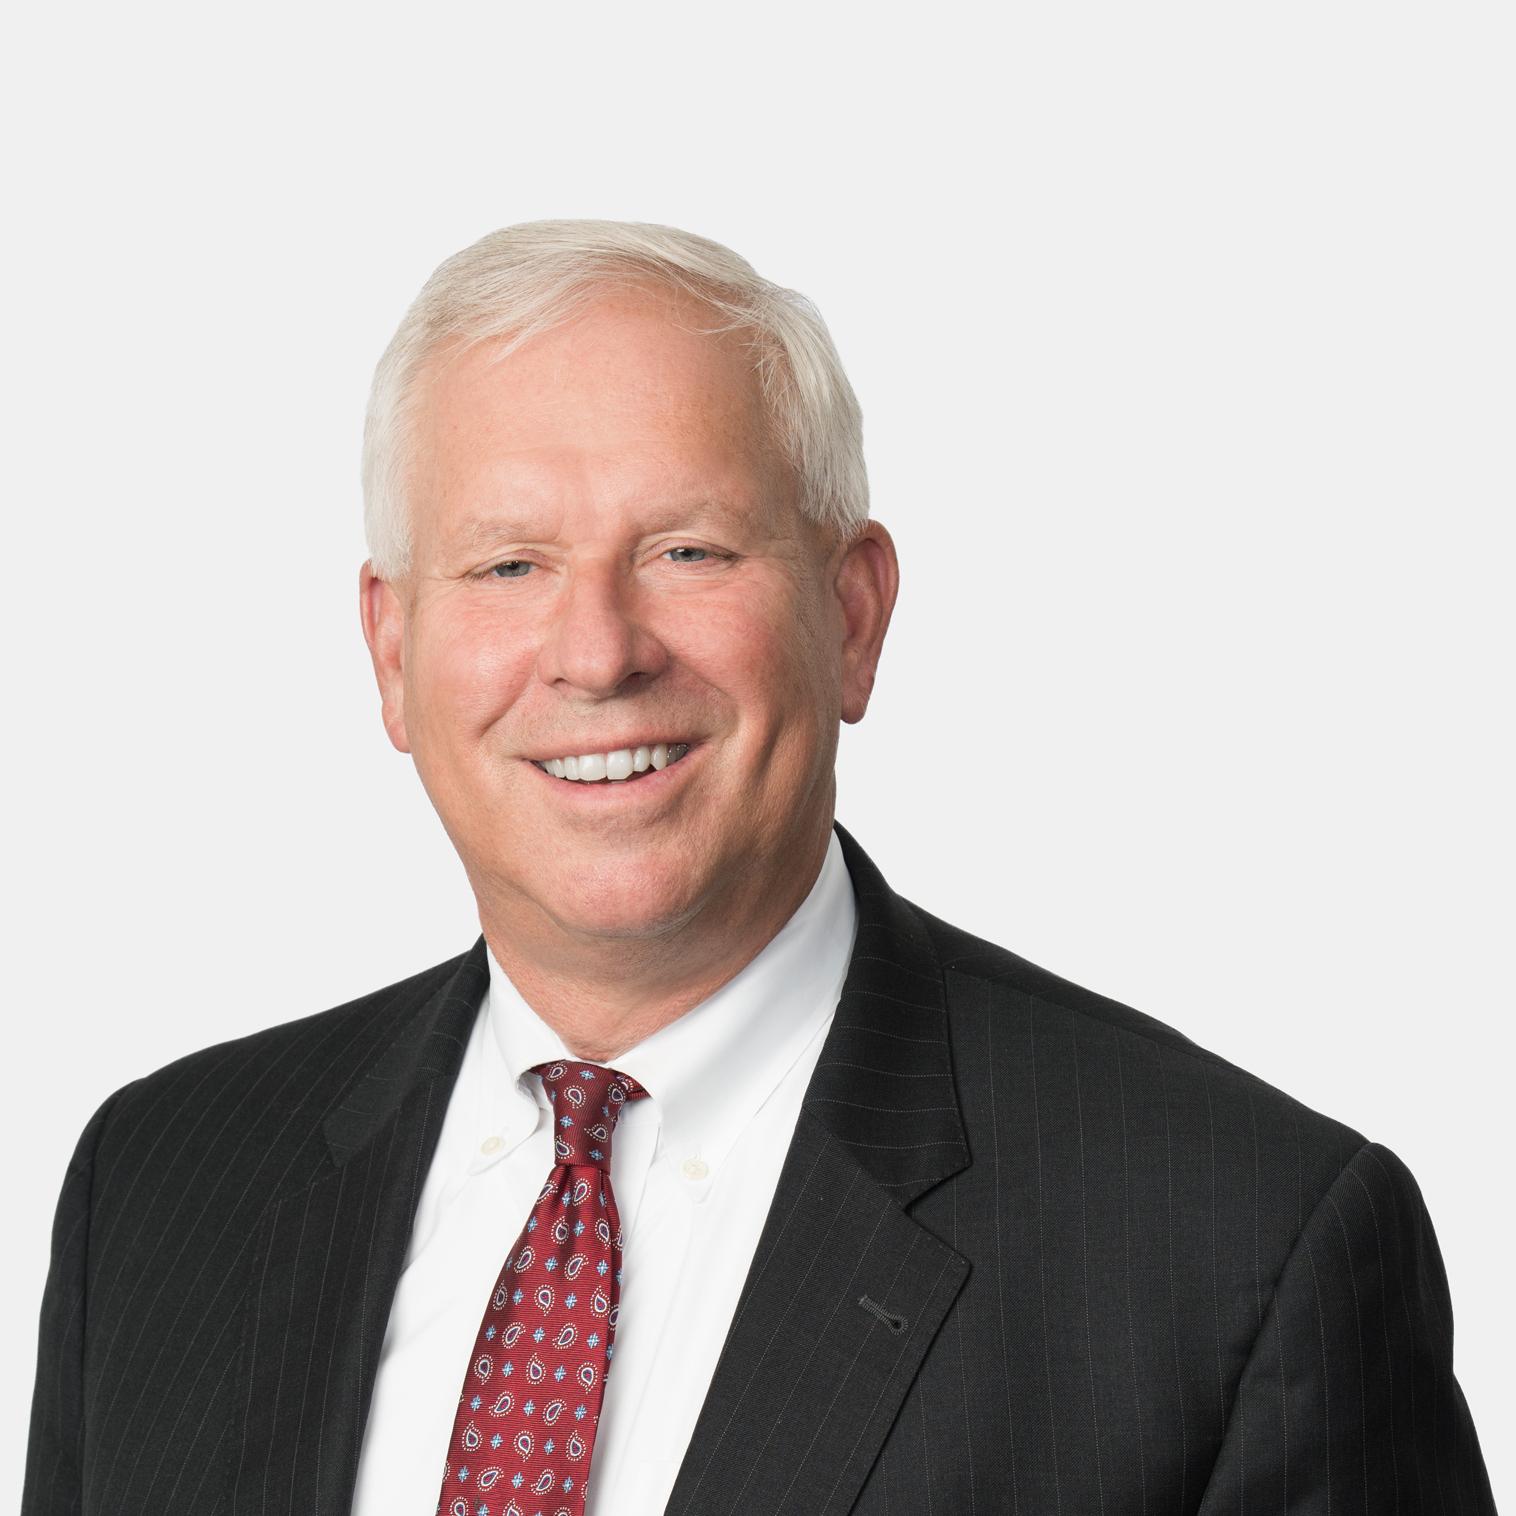 Jeffrey G. Gilmore